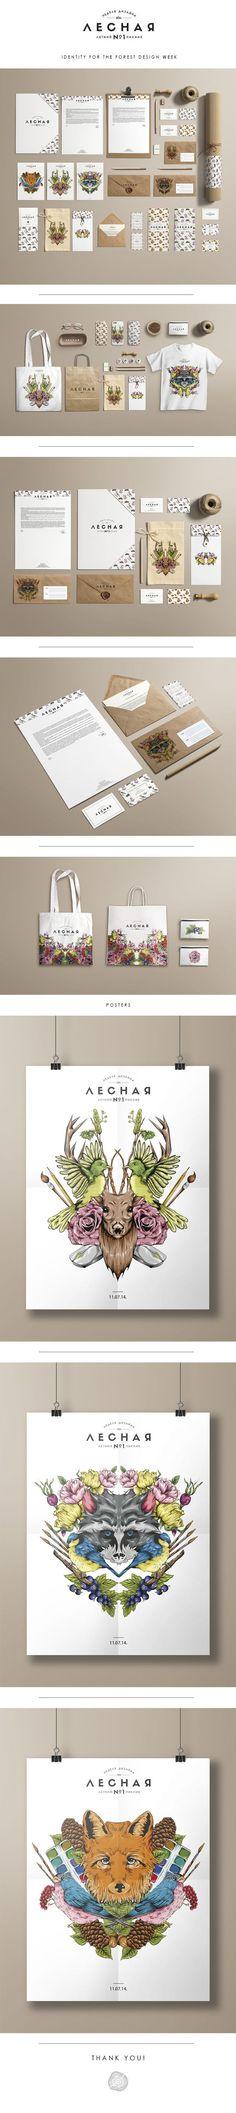 Cool Brand Identity Design. AECHAR. #branding #brandidentity [http://www.pinterest.com/alfredchong/]